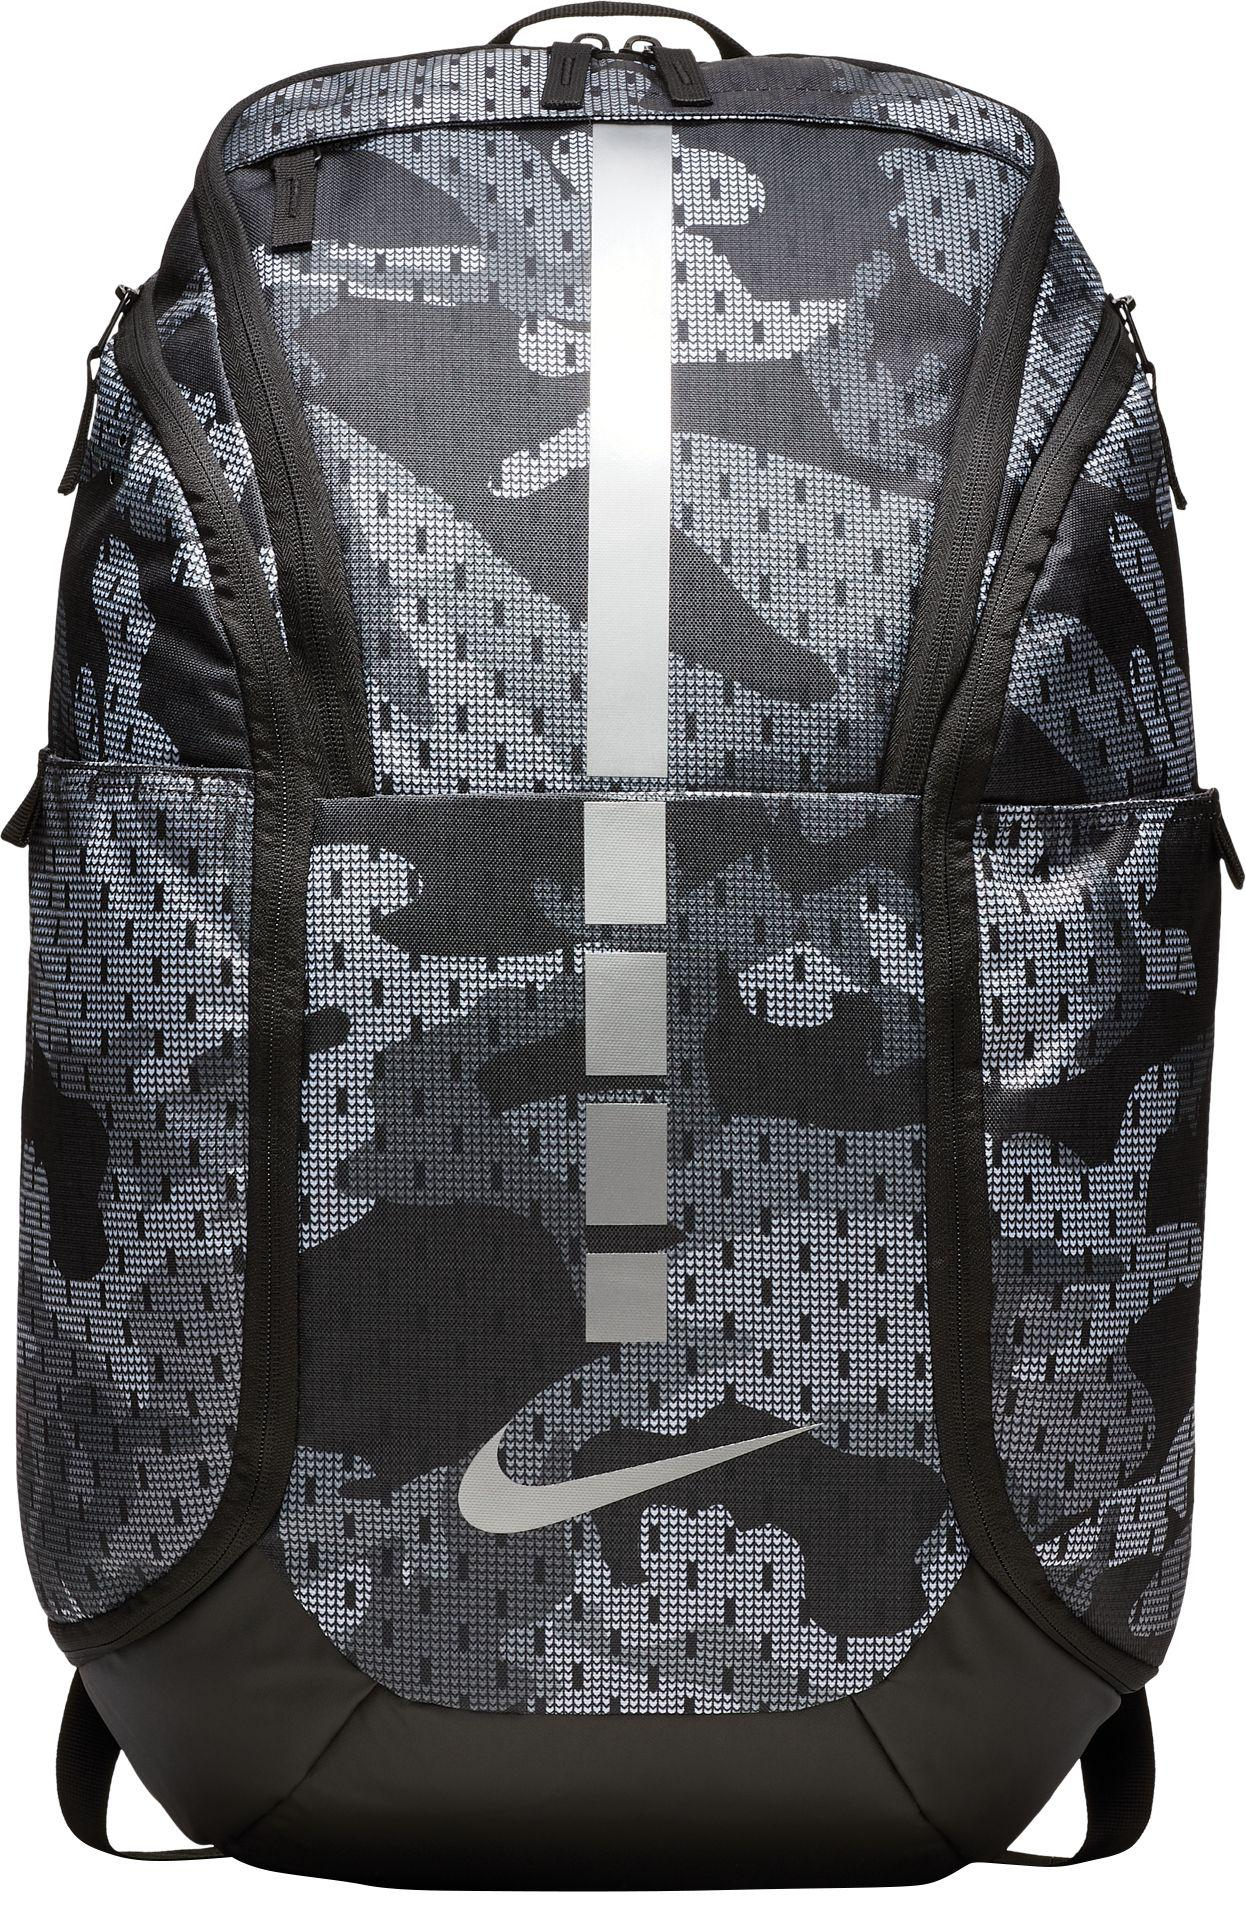 ... lyst nike hoops elite pro camo basketball backpack for men  nike  backpacks hoops elite max air ... c1ba69278